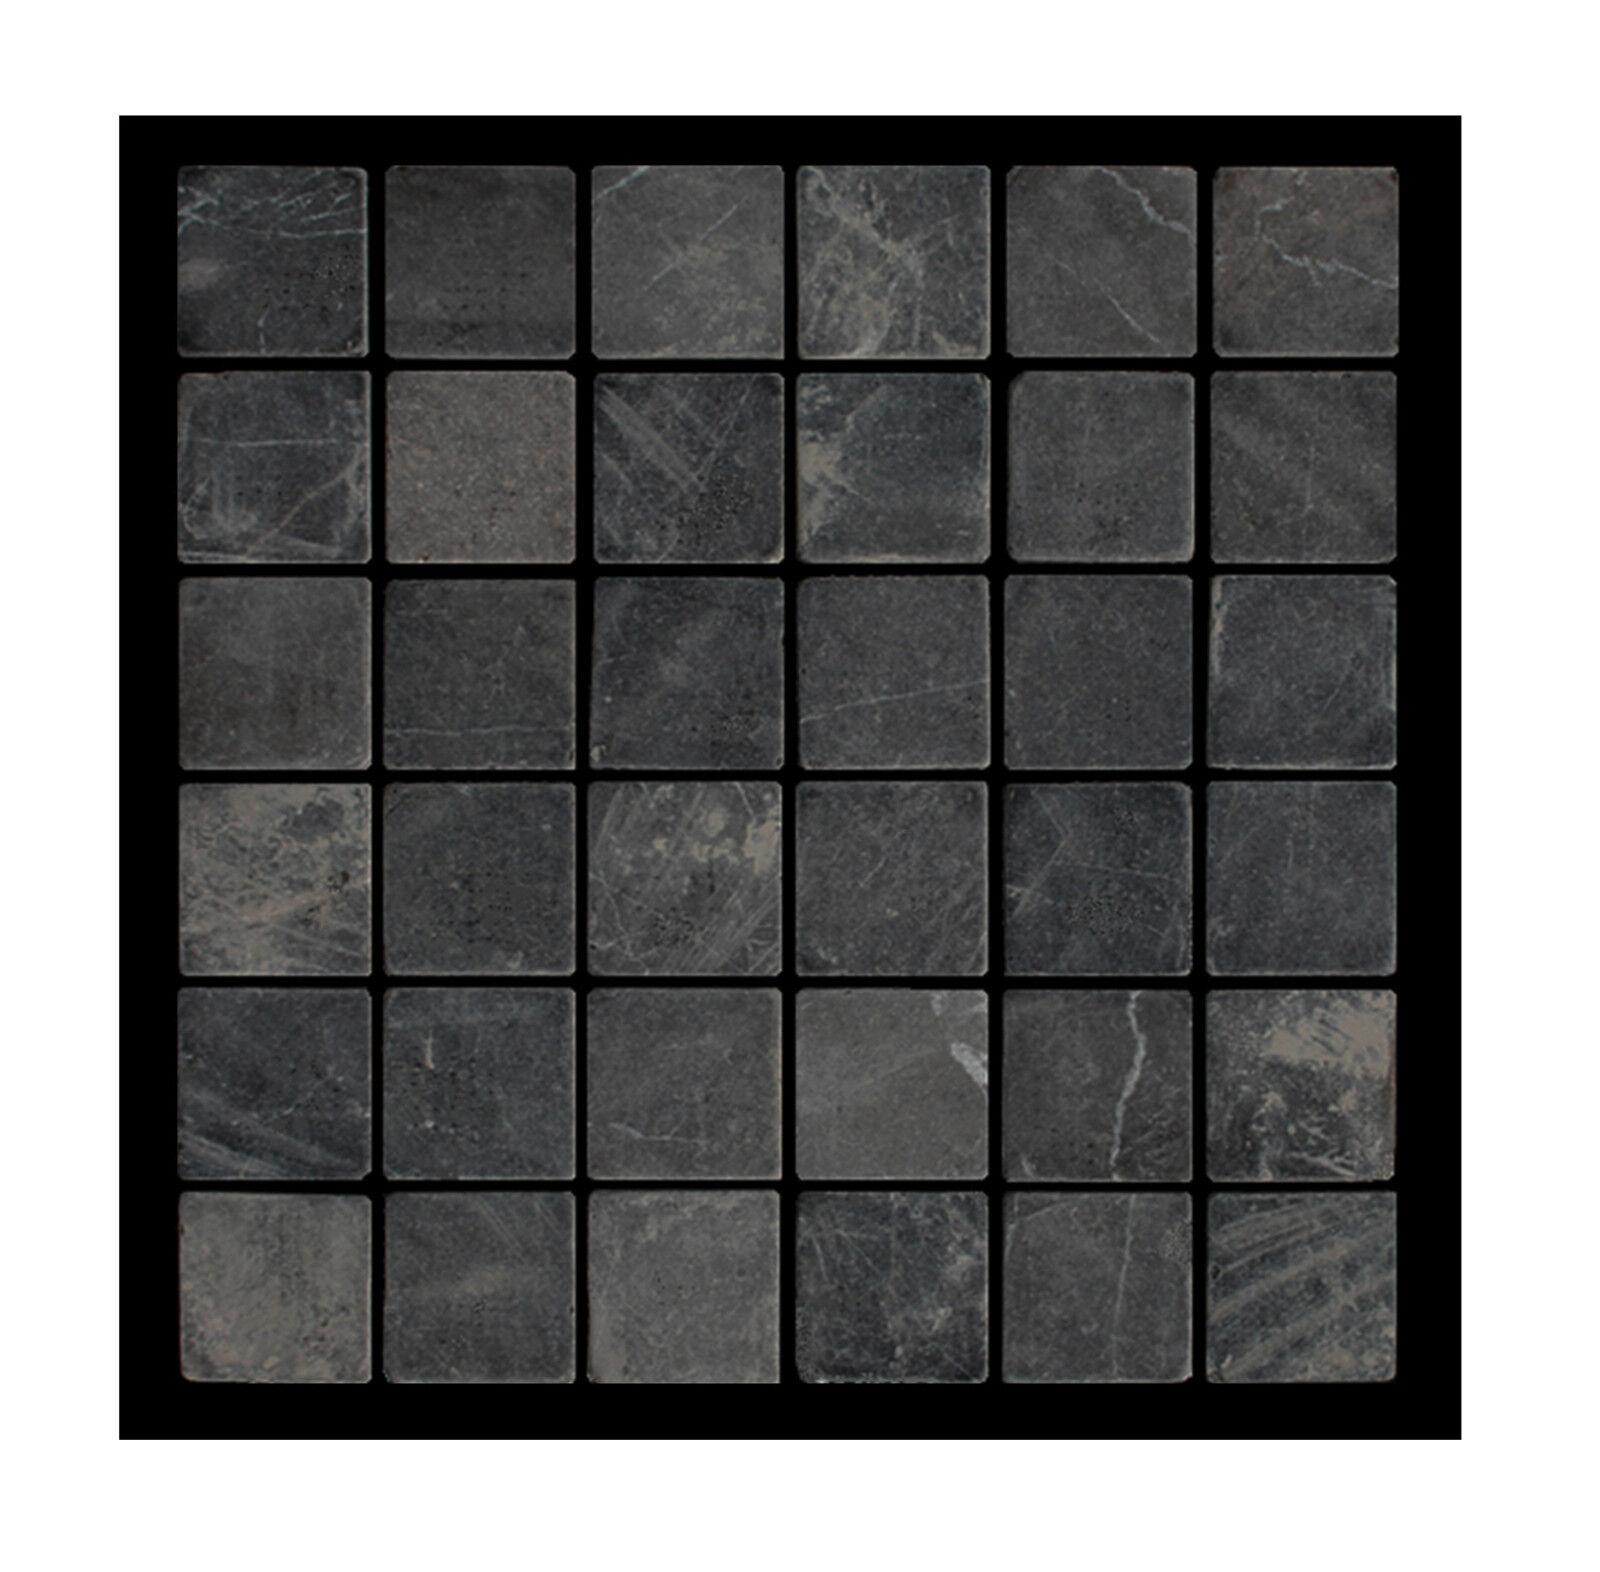 1 qm - PA-801 - Badfliesen Mosaikfliesen Pool Küchen Design Marmor-Mosaik